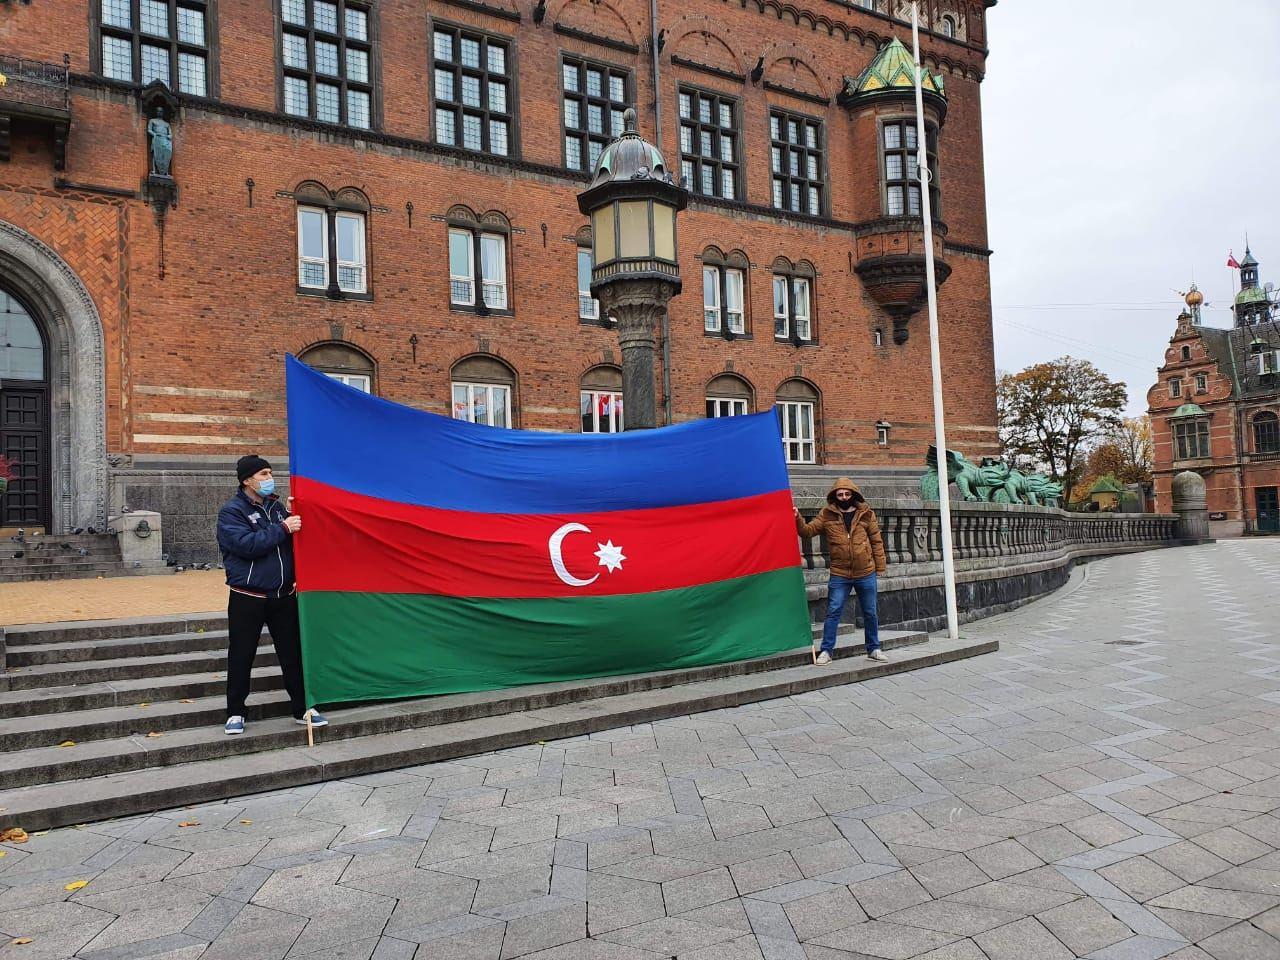 В Копенгагене решительно осудили армянский террор в Гяндже (ФОТО) - Gallery Image